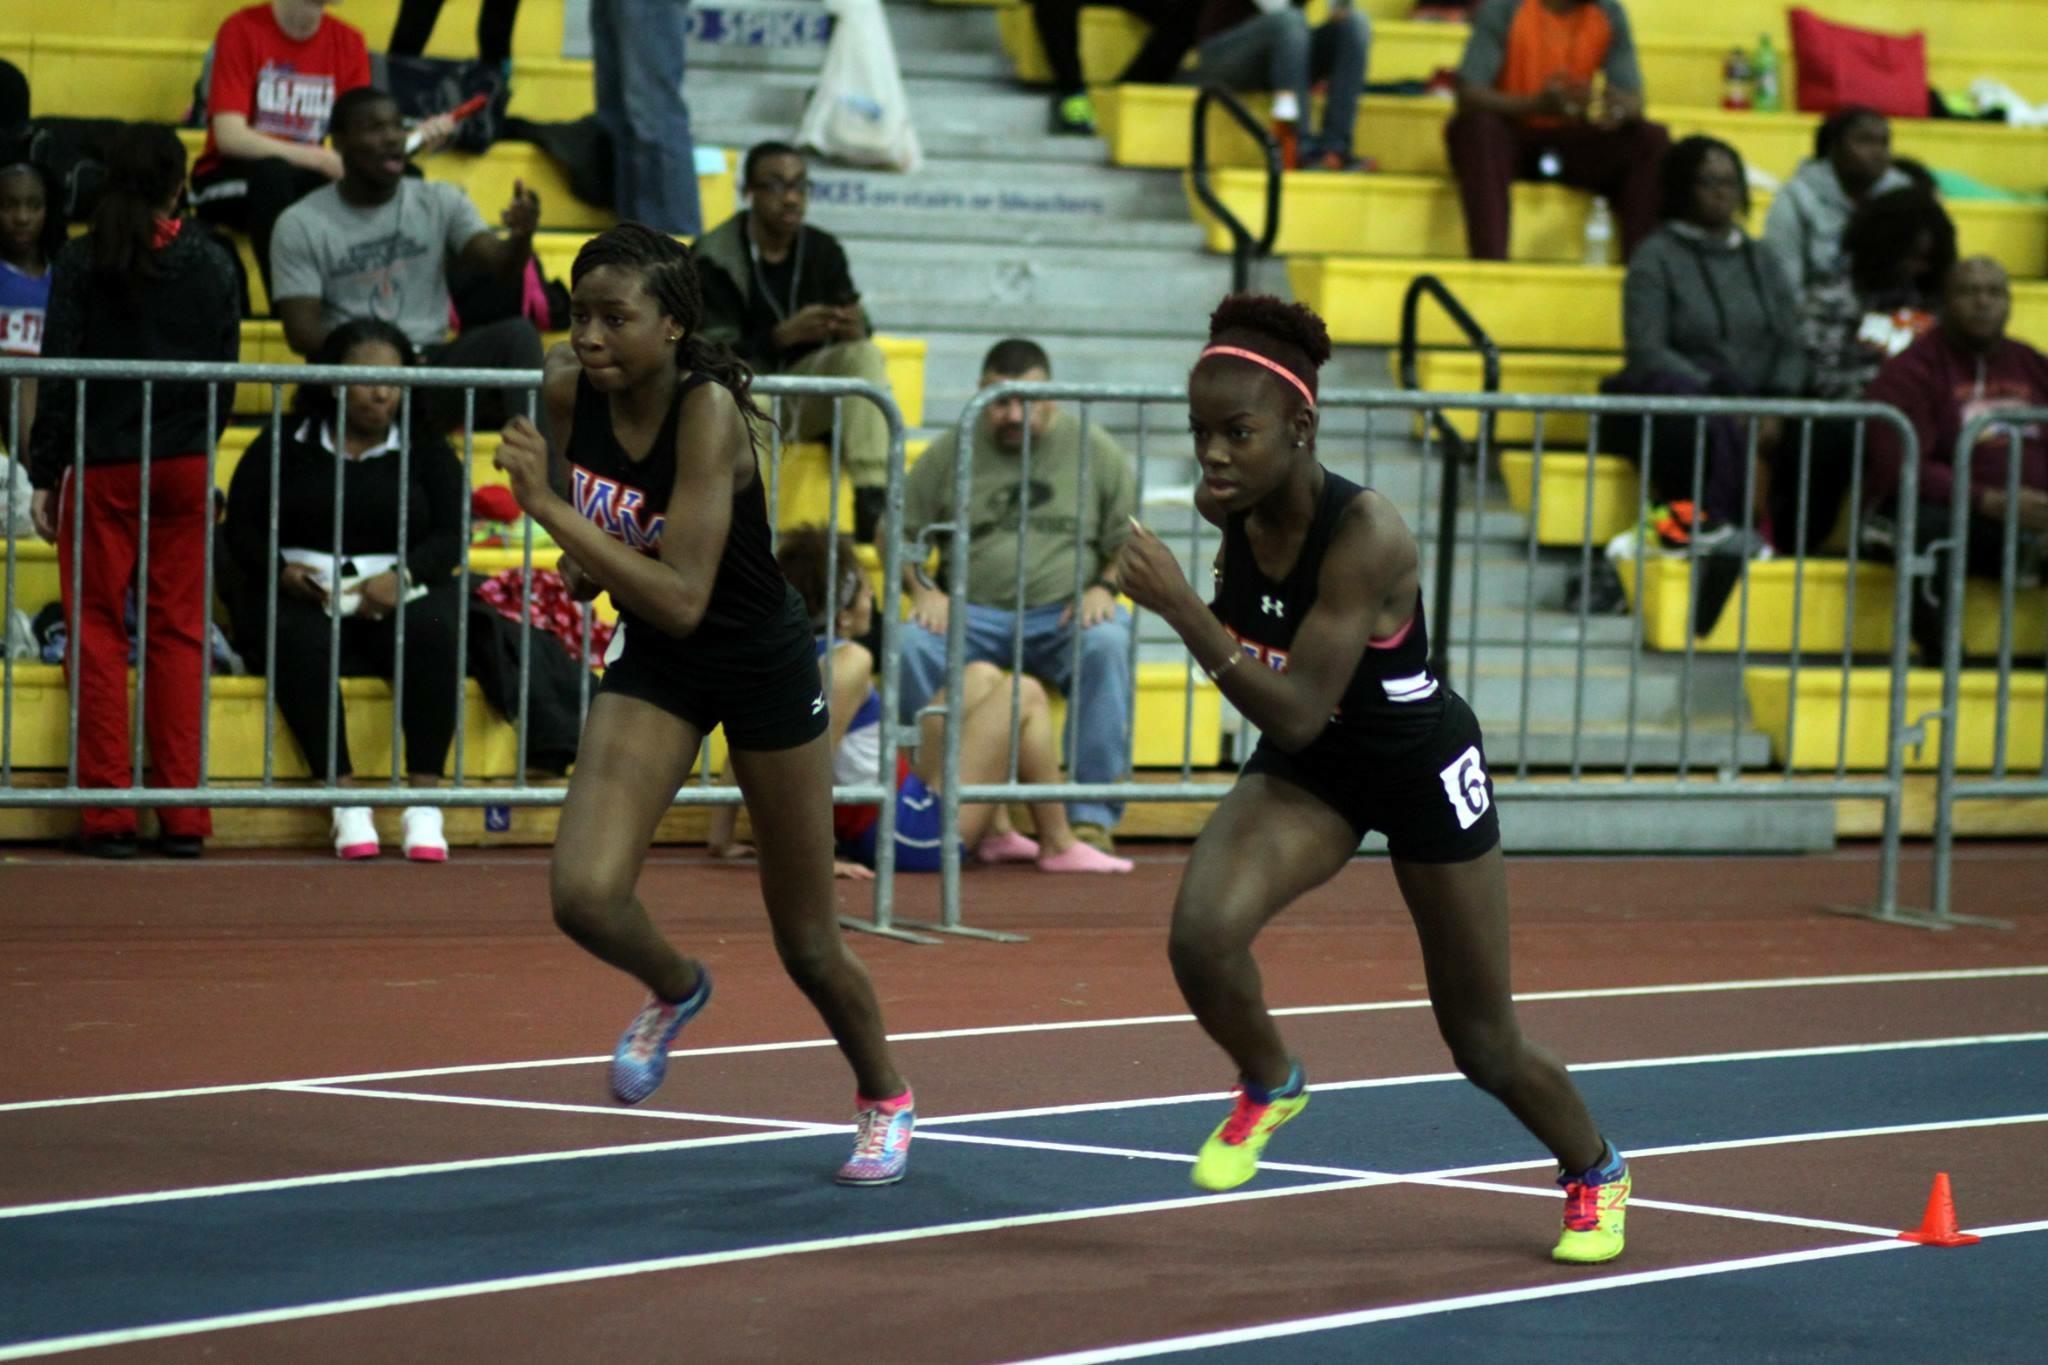 Watkins Mill girls senior Rhoda Miller and freshman Theresa Secke take off in girls 500m